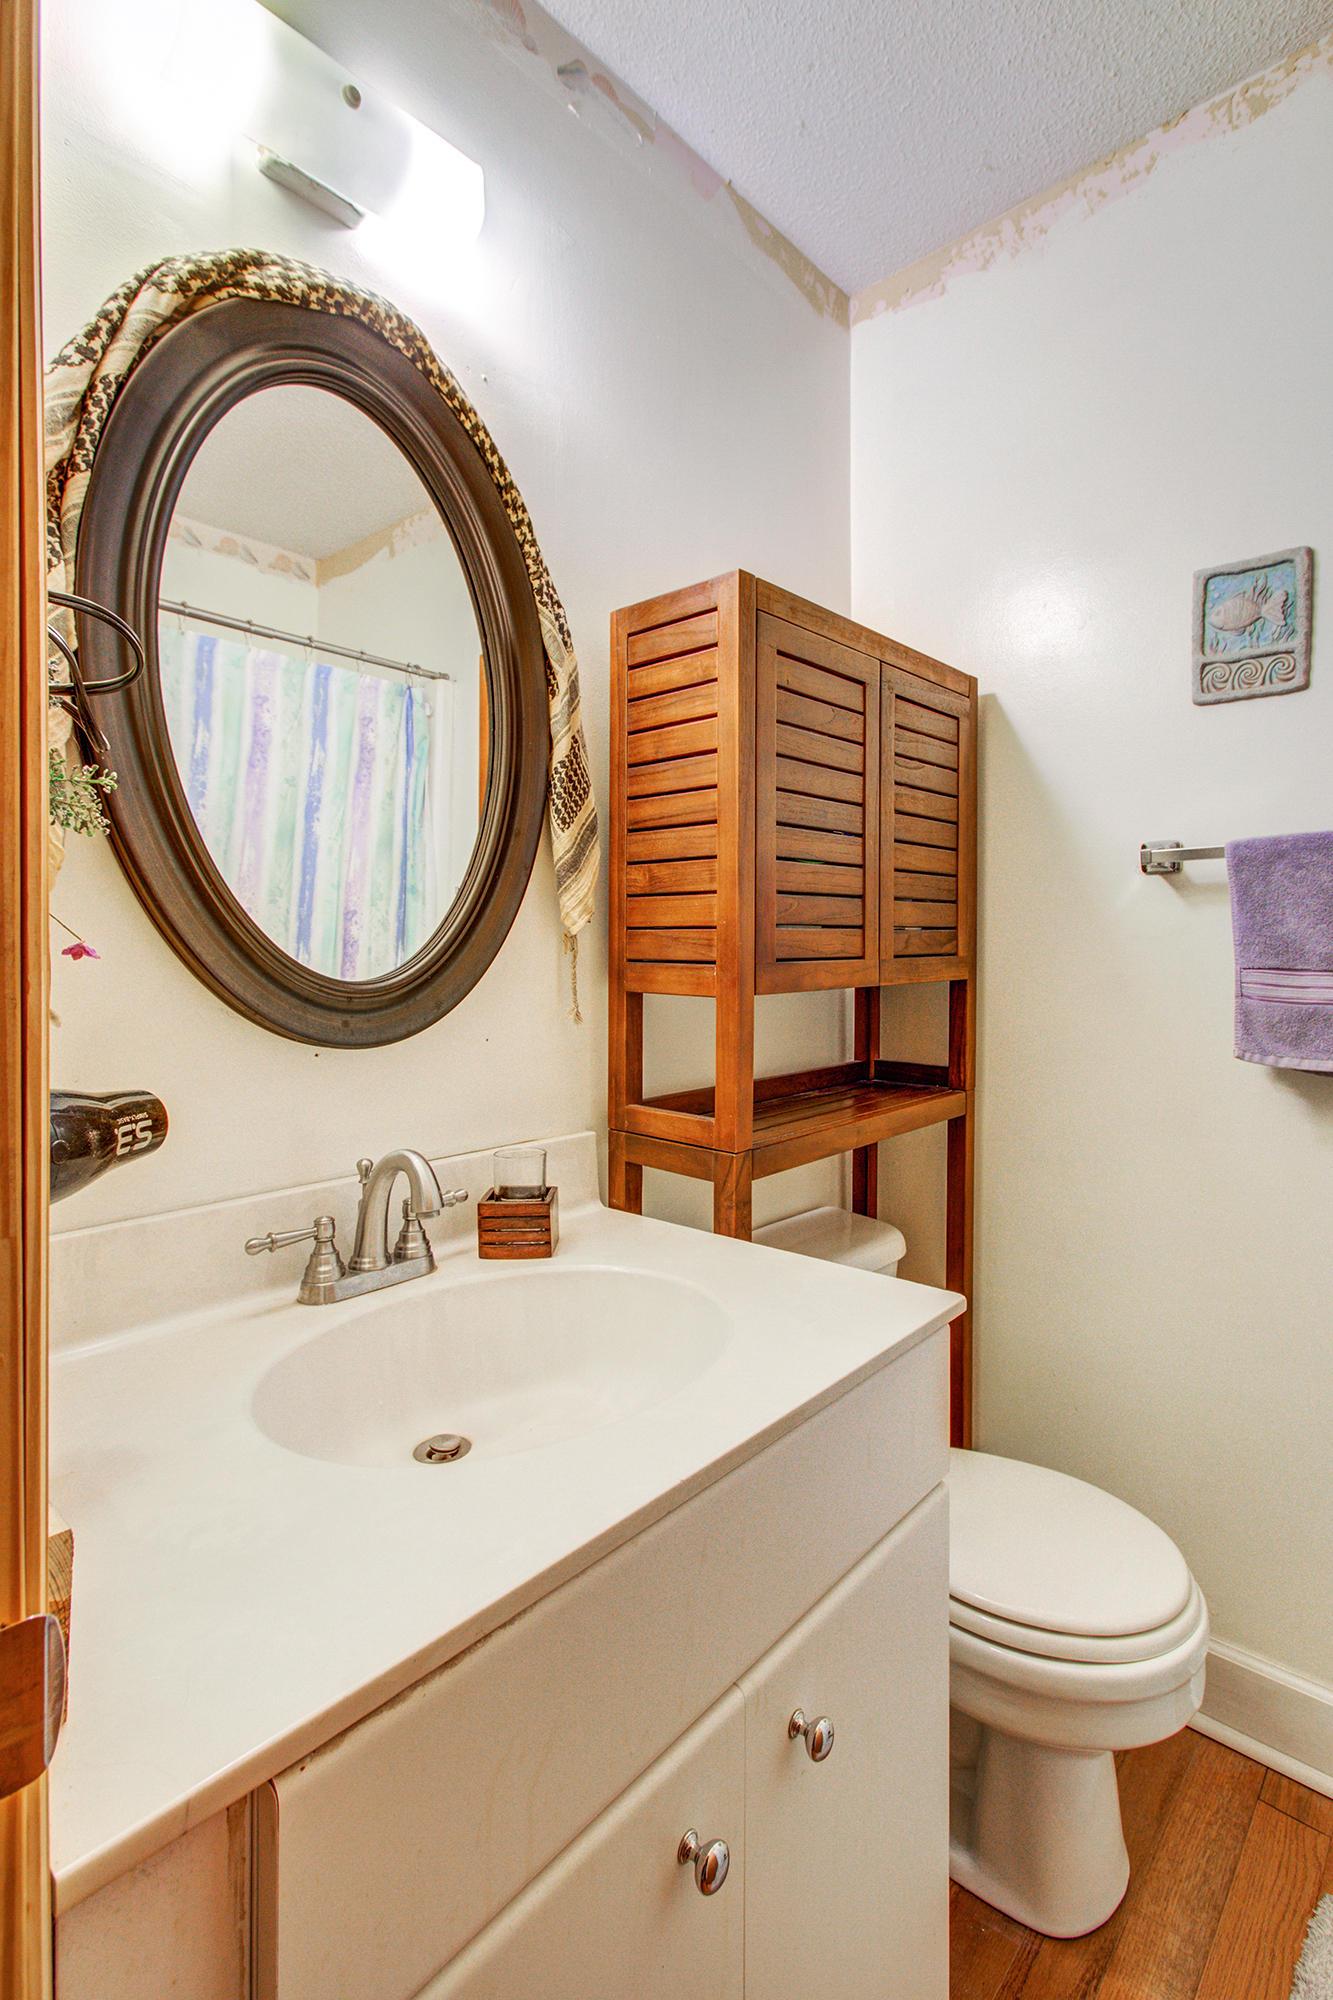 Wando Lakes Homes For Sale - 858 Fairlawn, Mount Pleasant, SC - 21